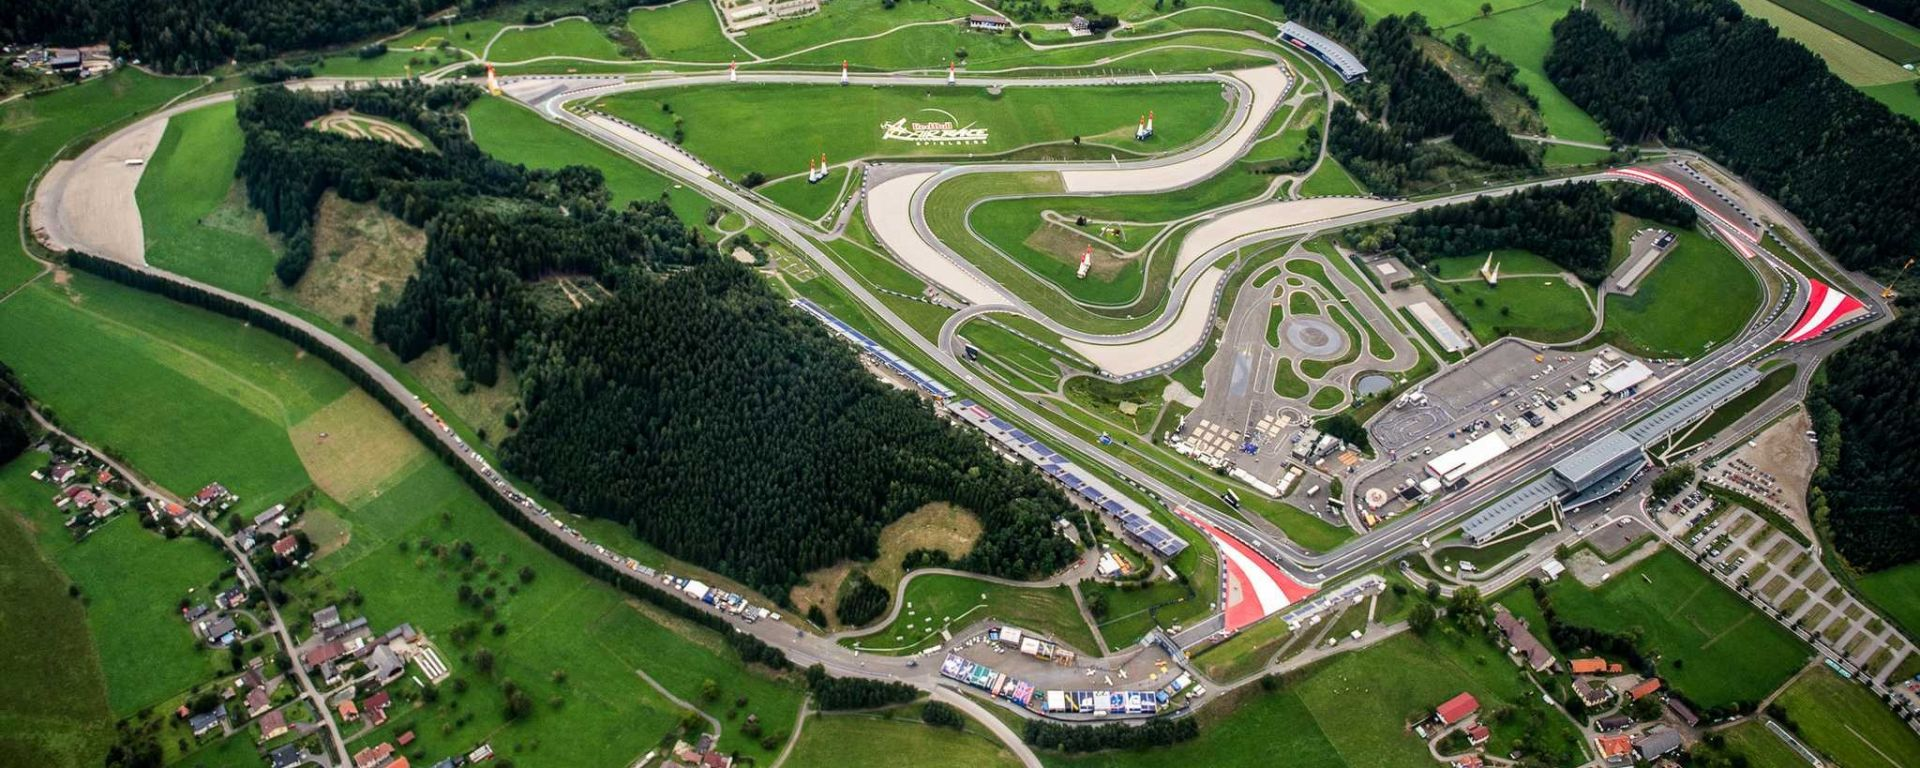 600751 5x2 lg - MotoGP- A1 Ring - GP Austria-9/10/11 agosto 2019